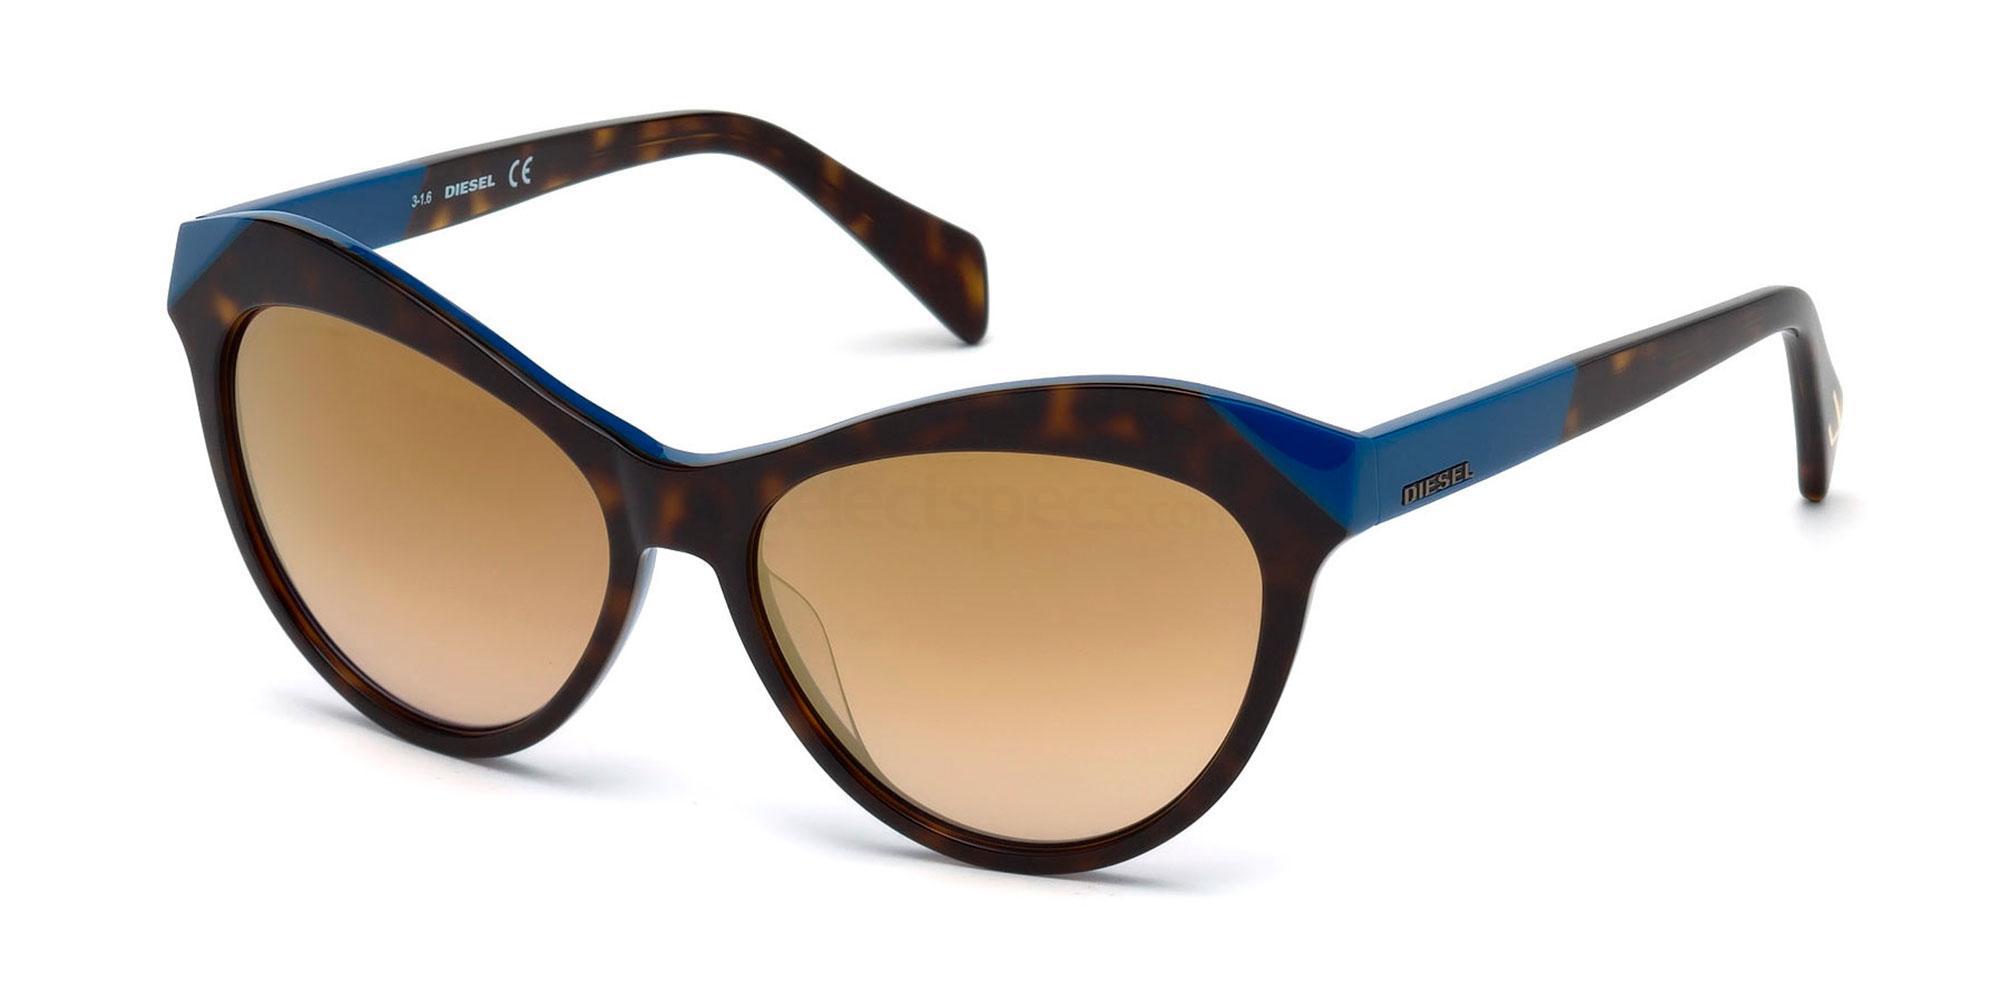 56L DL0225 Sunglasses, Diesel